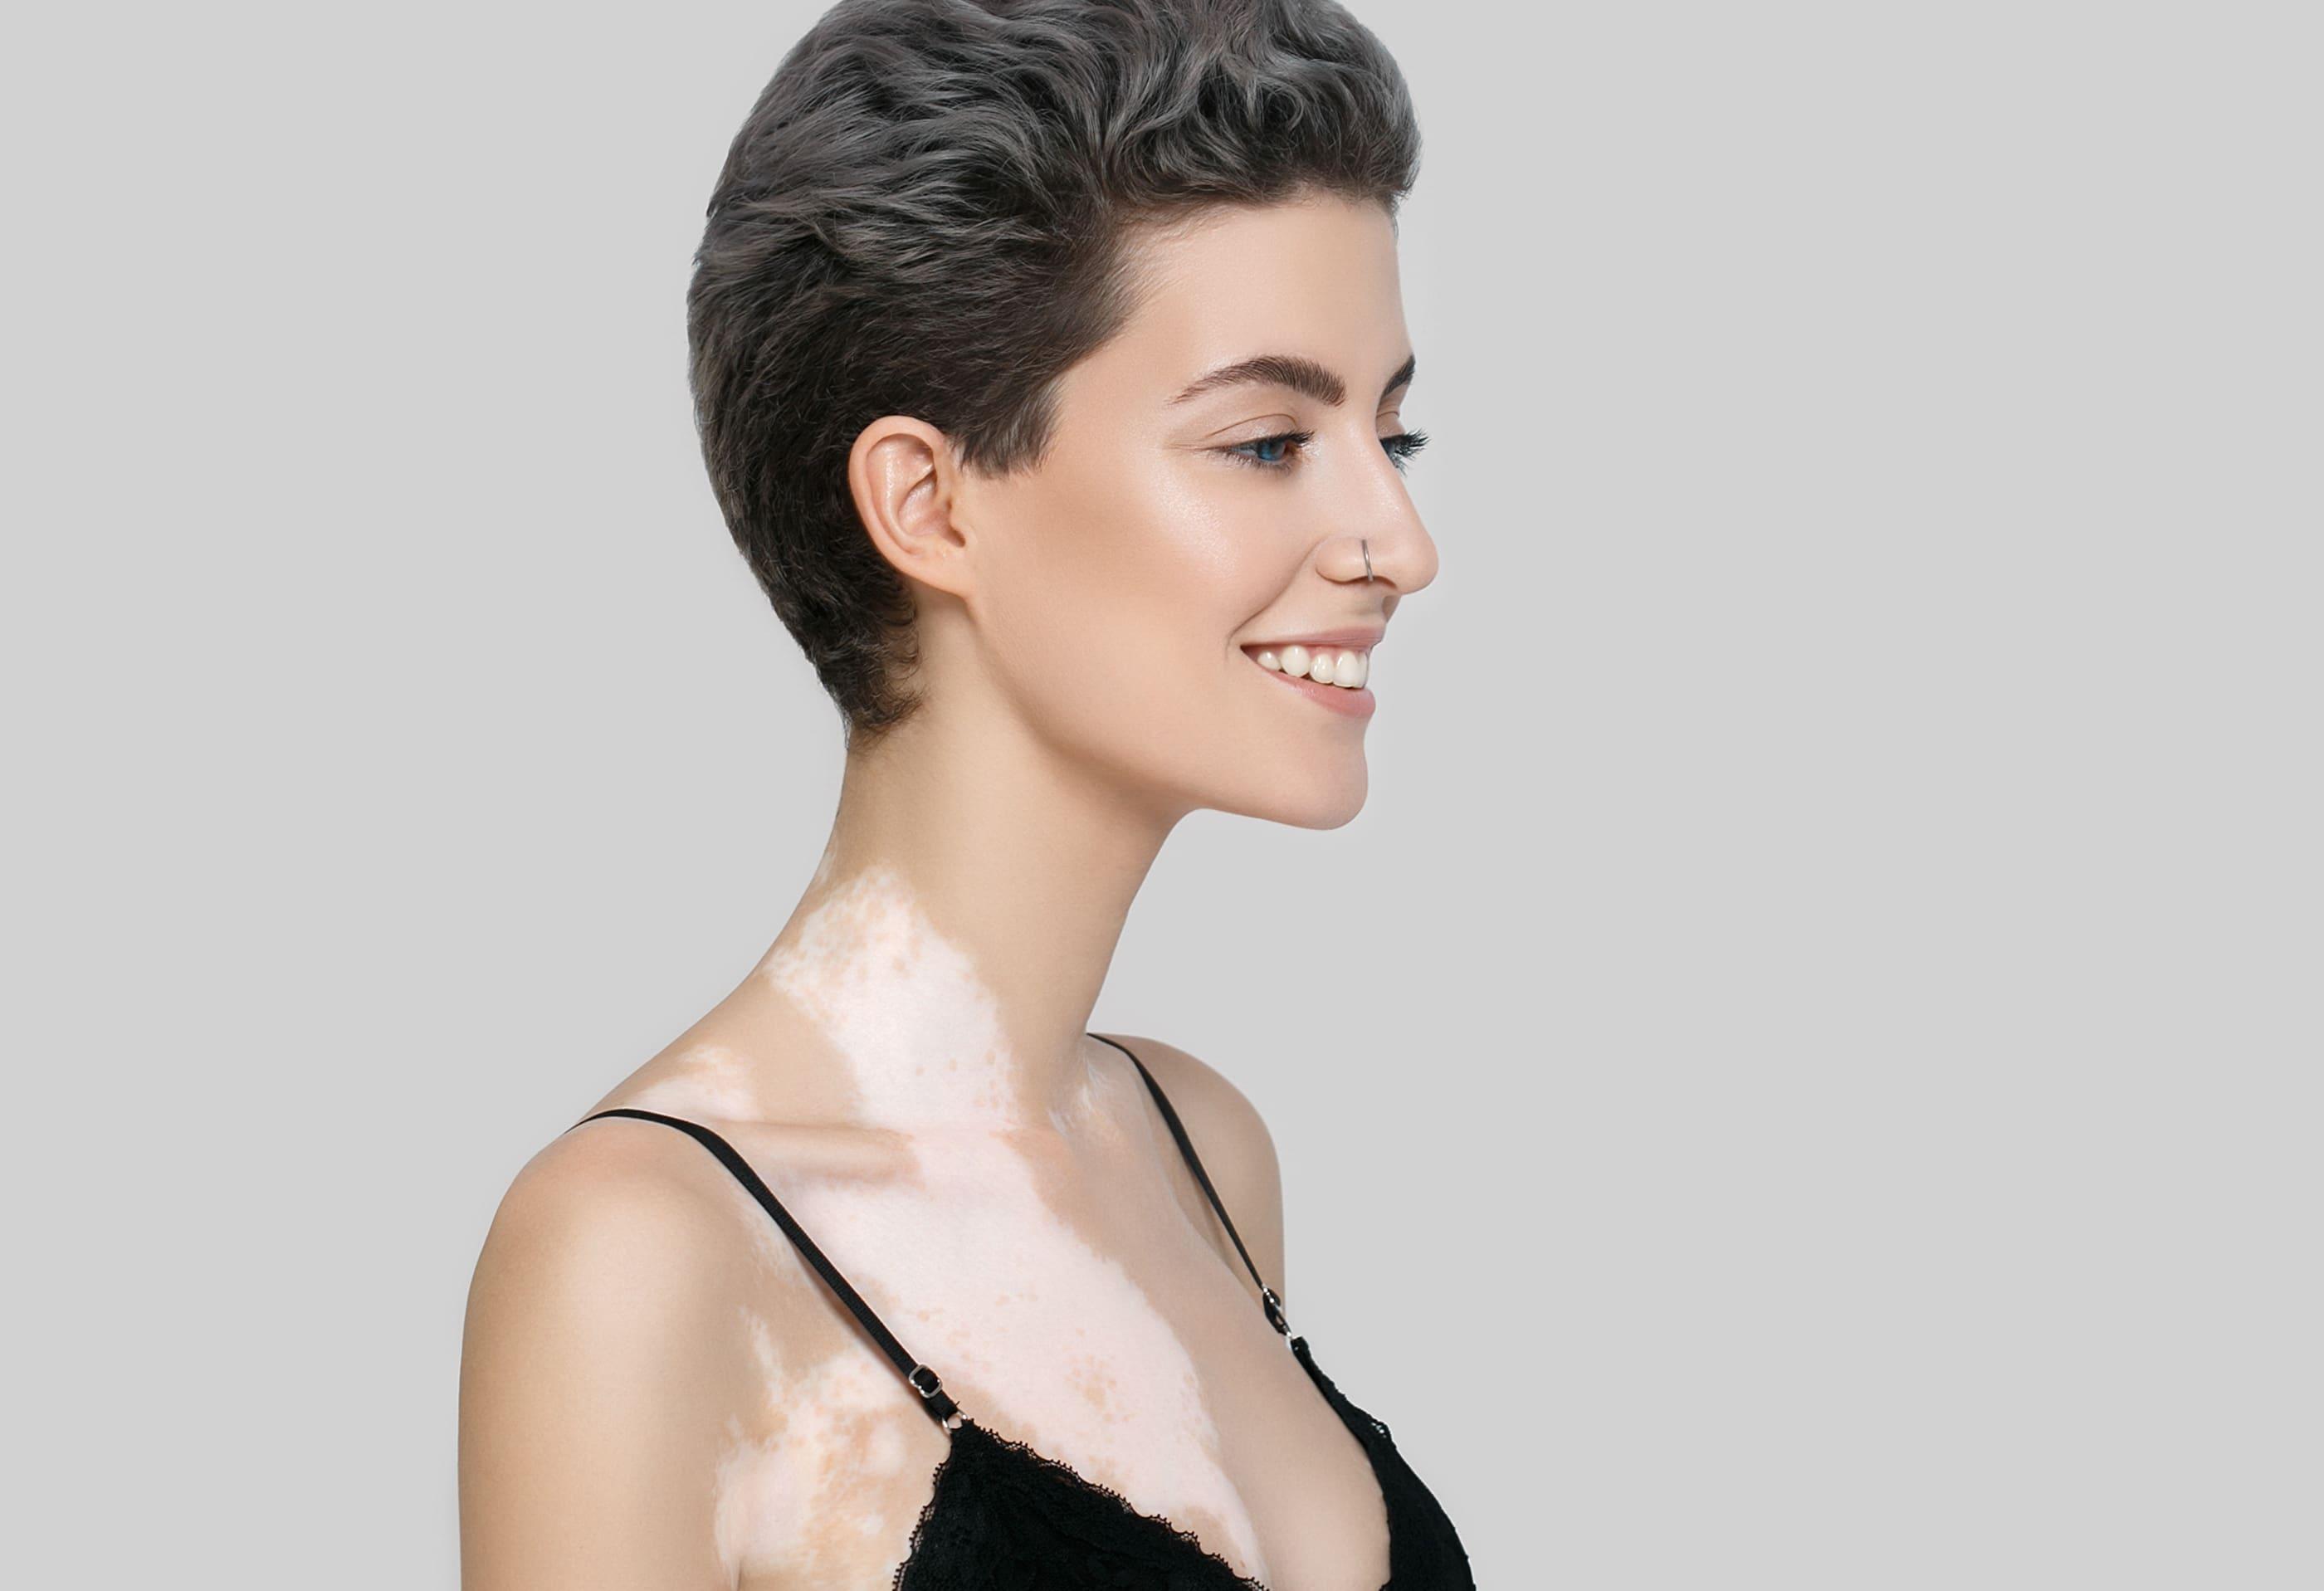 Photo of a woman with vitiligo a melanocyte dysfunction